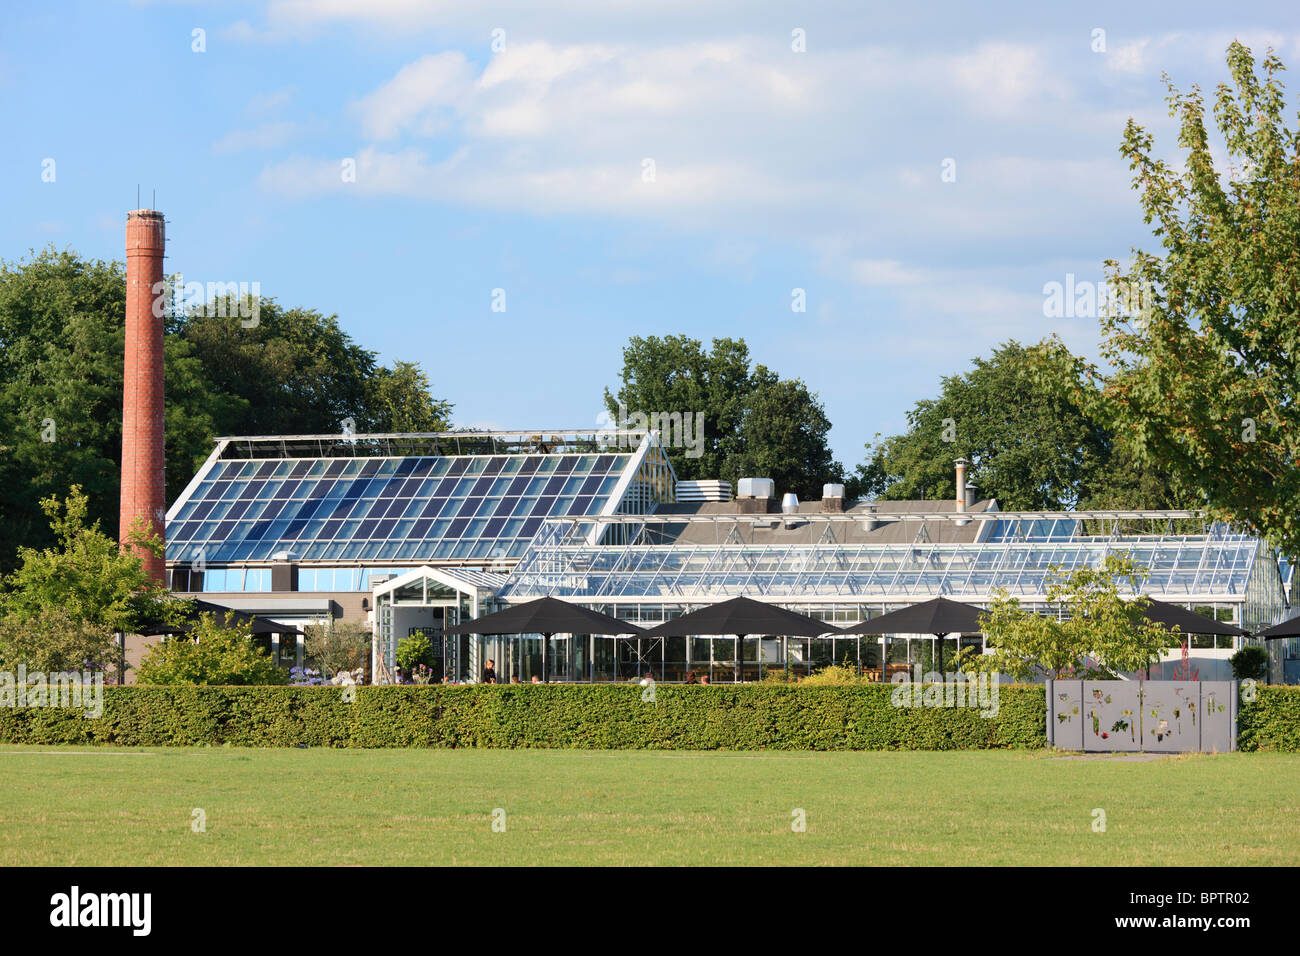 Restaurant and nursery de kas in amsterdam watergraafsmeer for Funda amsterdam watergraafsmeer